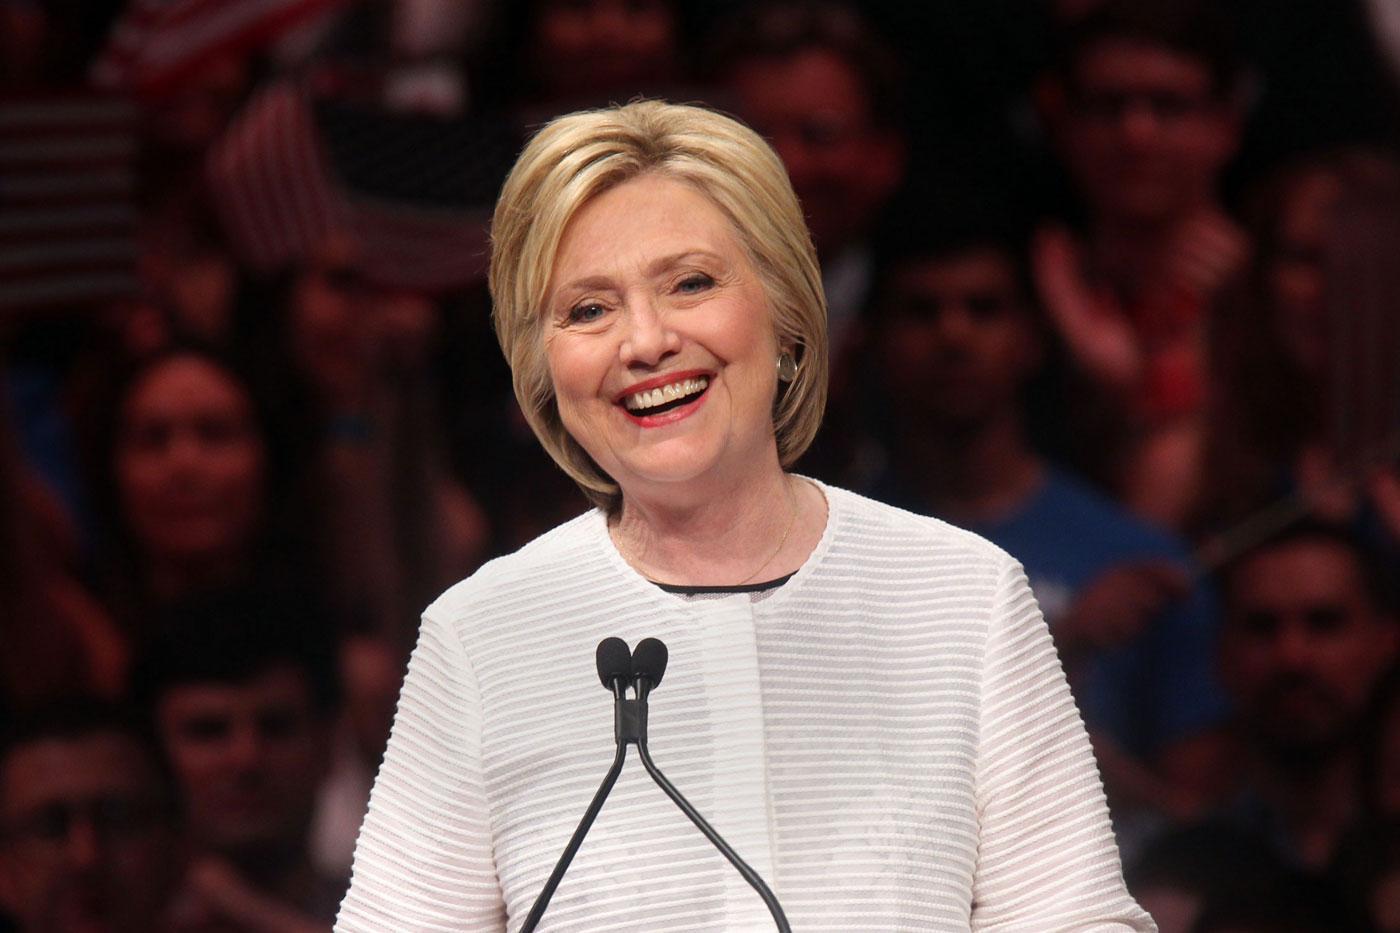 Stars react to Hillary Clinton's historic moment